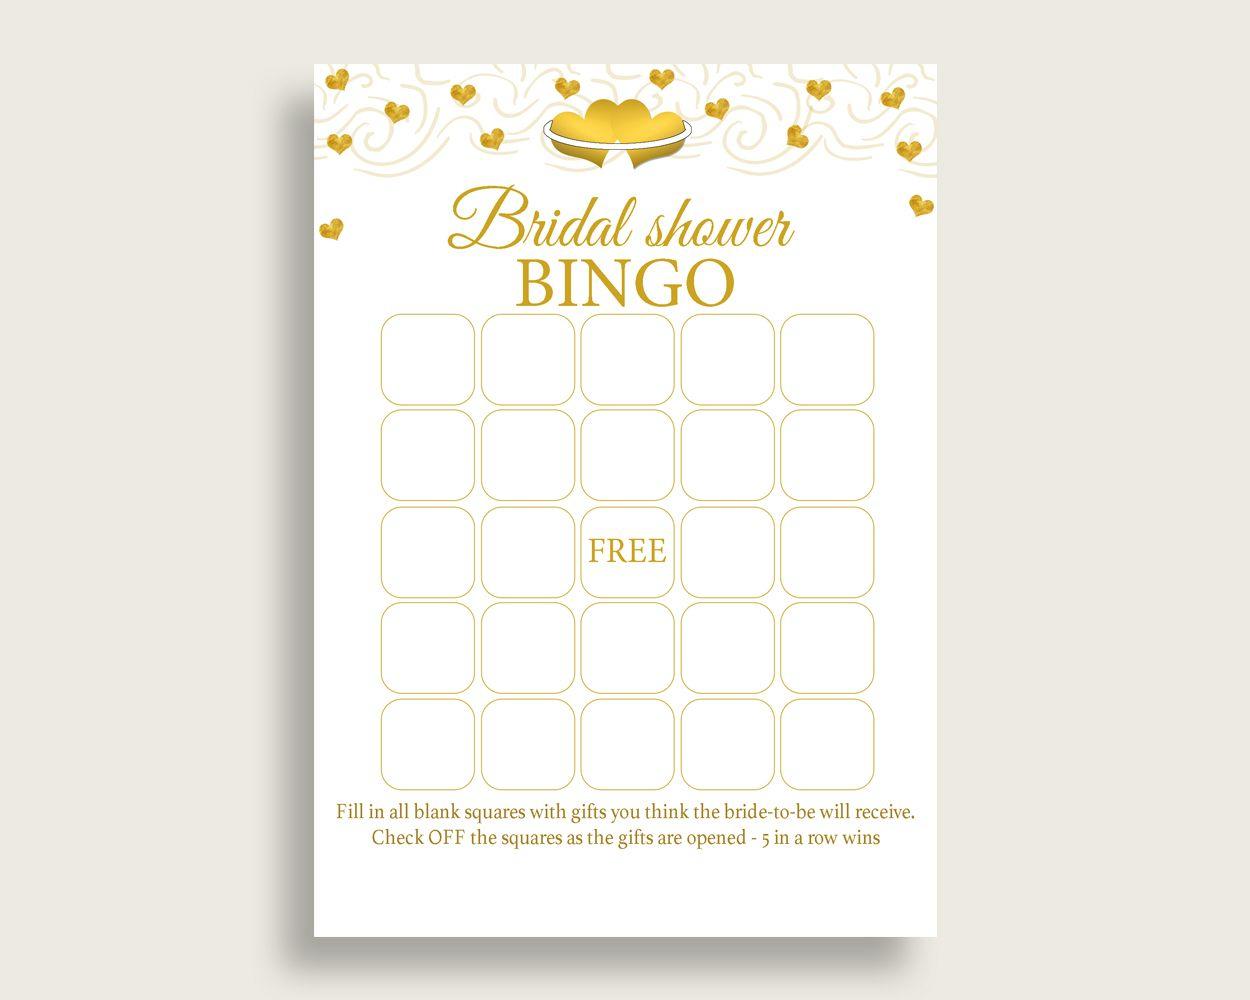 Burgundy Bridal Shower Blank Bingo Game Cards Printable